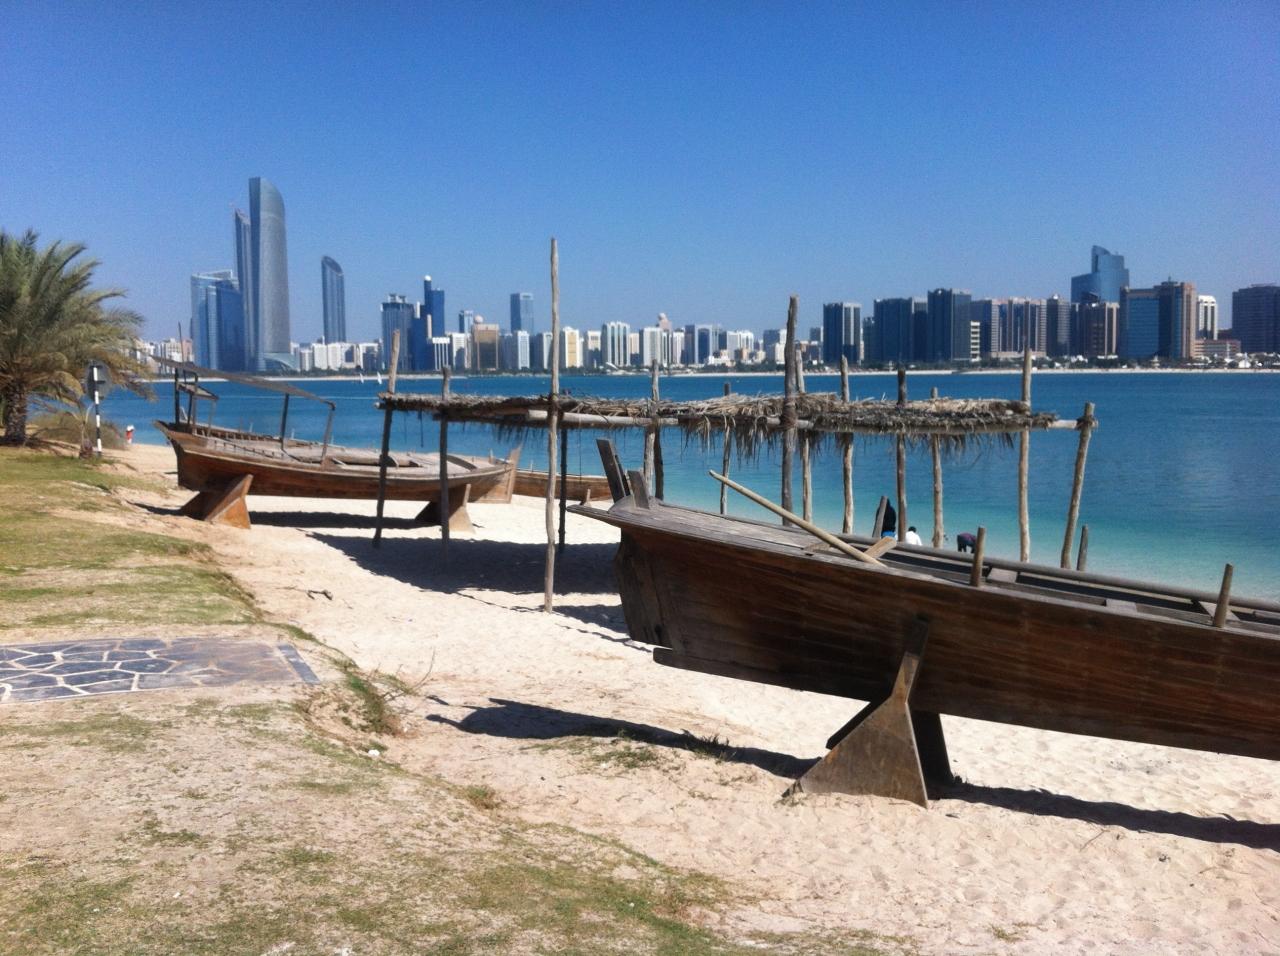 〜Abu Dhabi Emirate〜